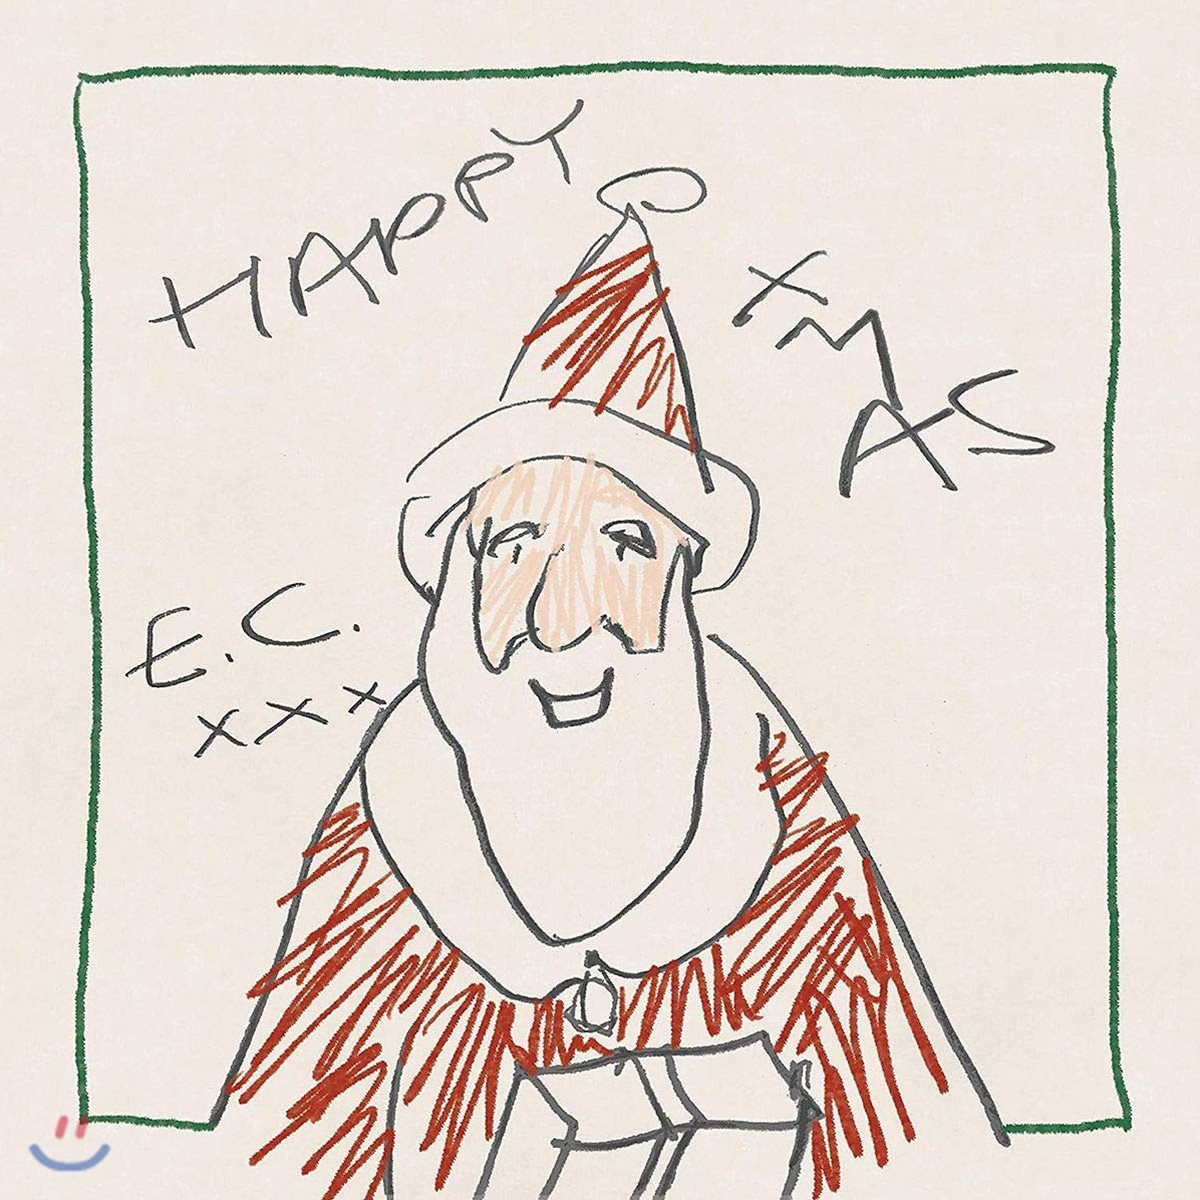 Eric Clapton - Happy Xmas 에릭 클랩튼 크리스마스 앨범